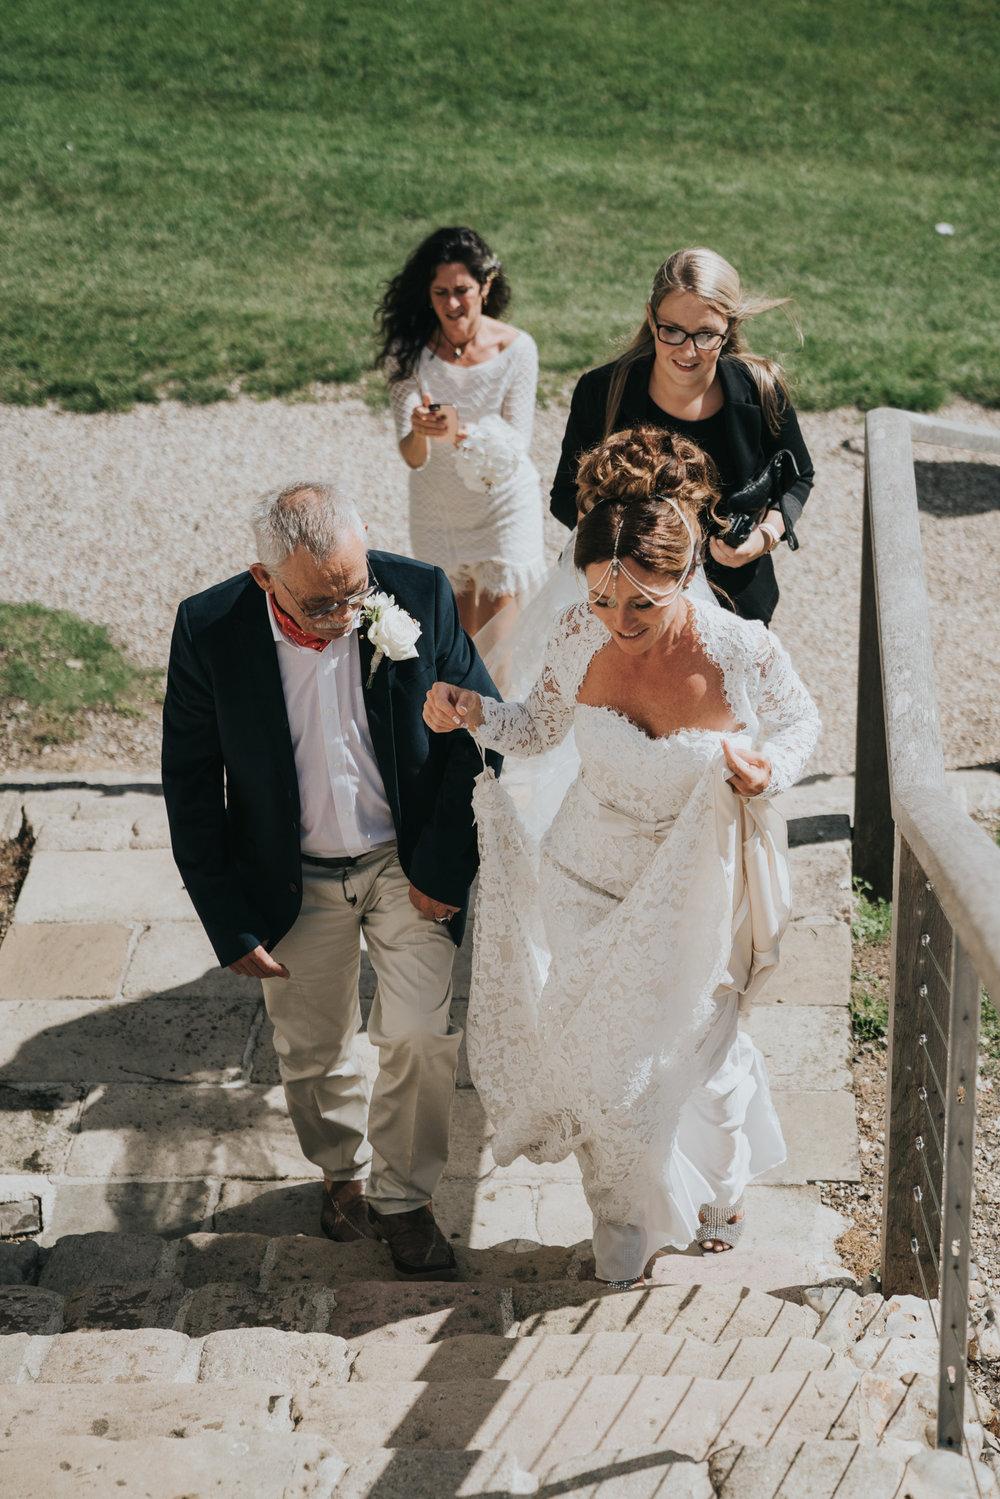 grace-elizabeth-boho-wedding-headingham-castle-essex-wedding-photographer-24.jpg